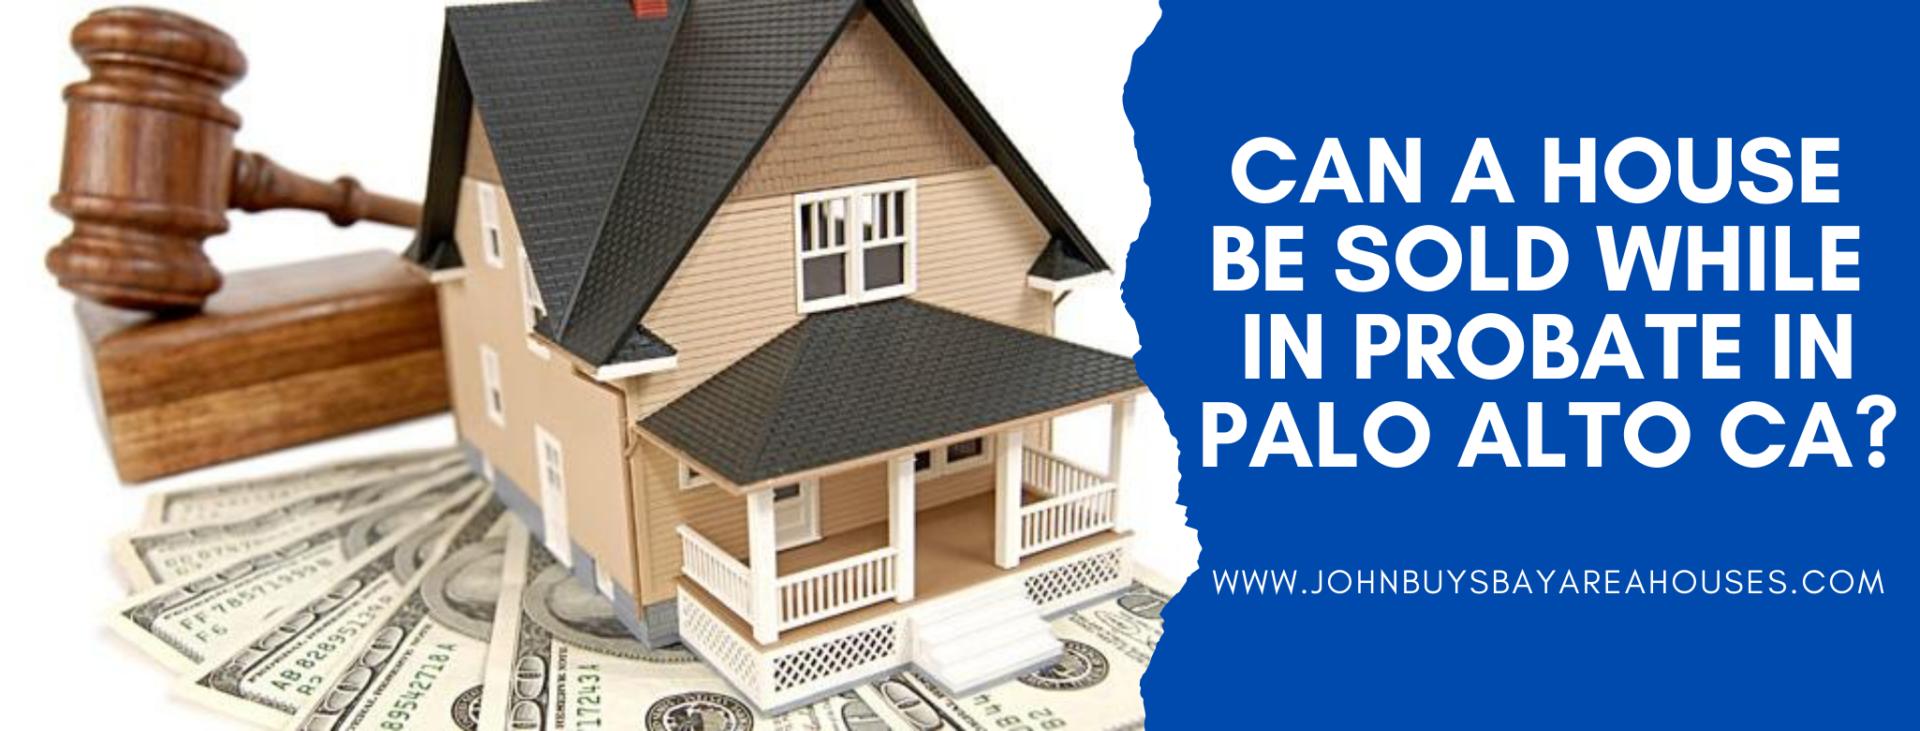 We buy properties in Palo Alto CA